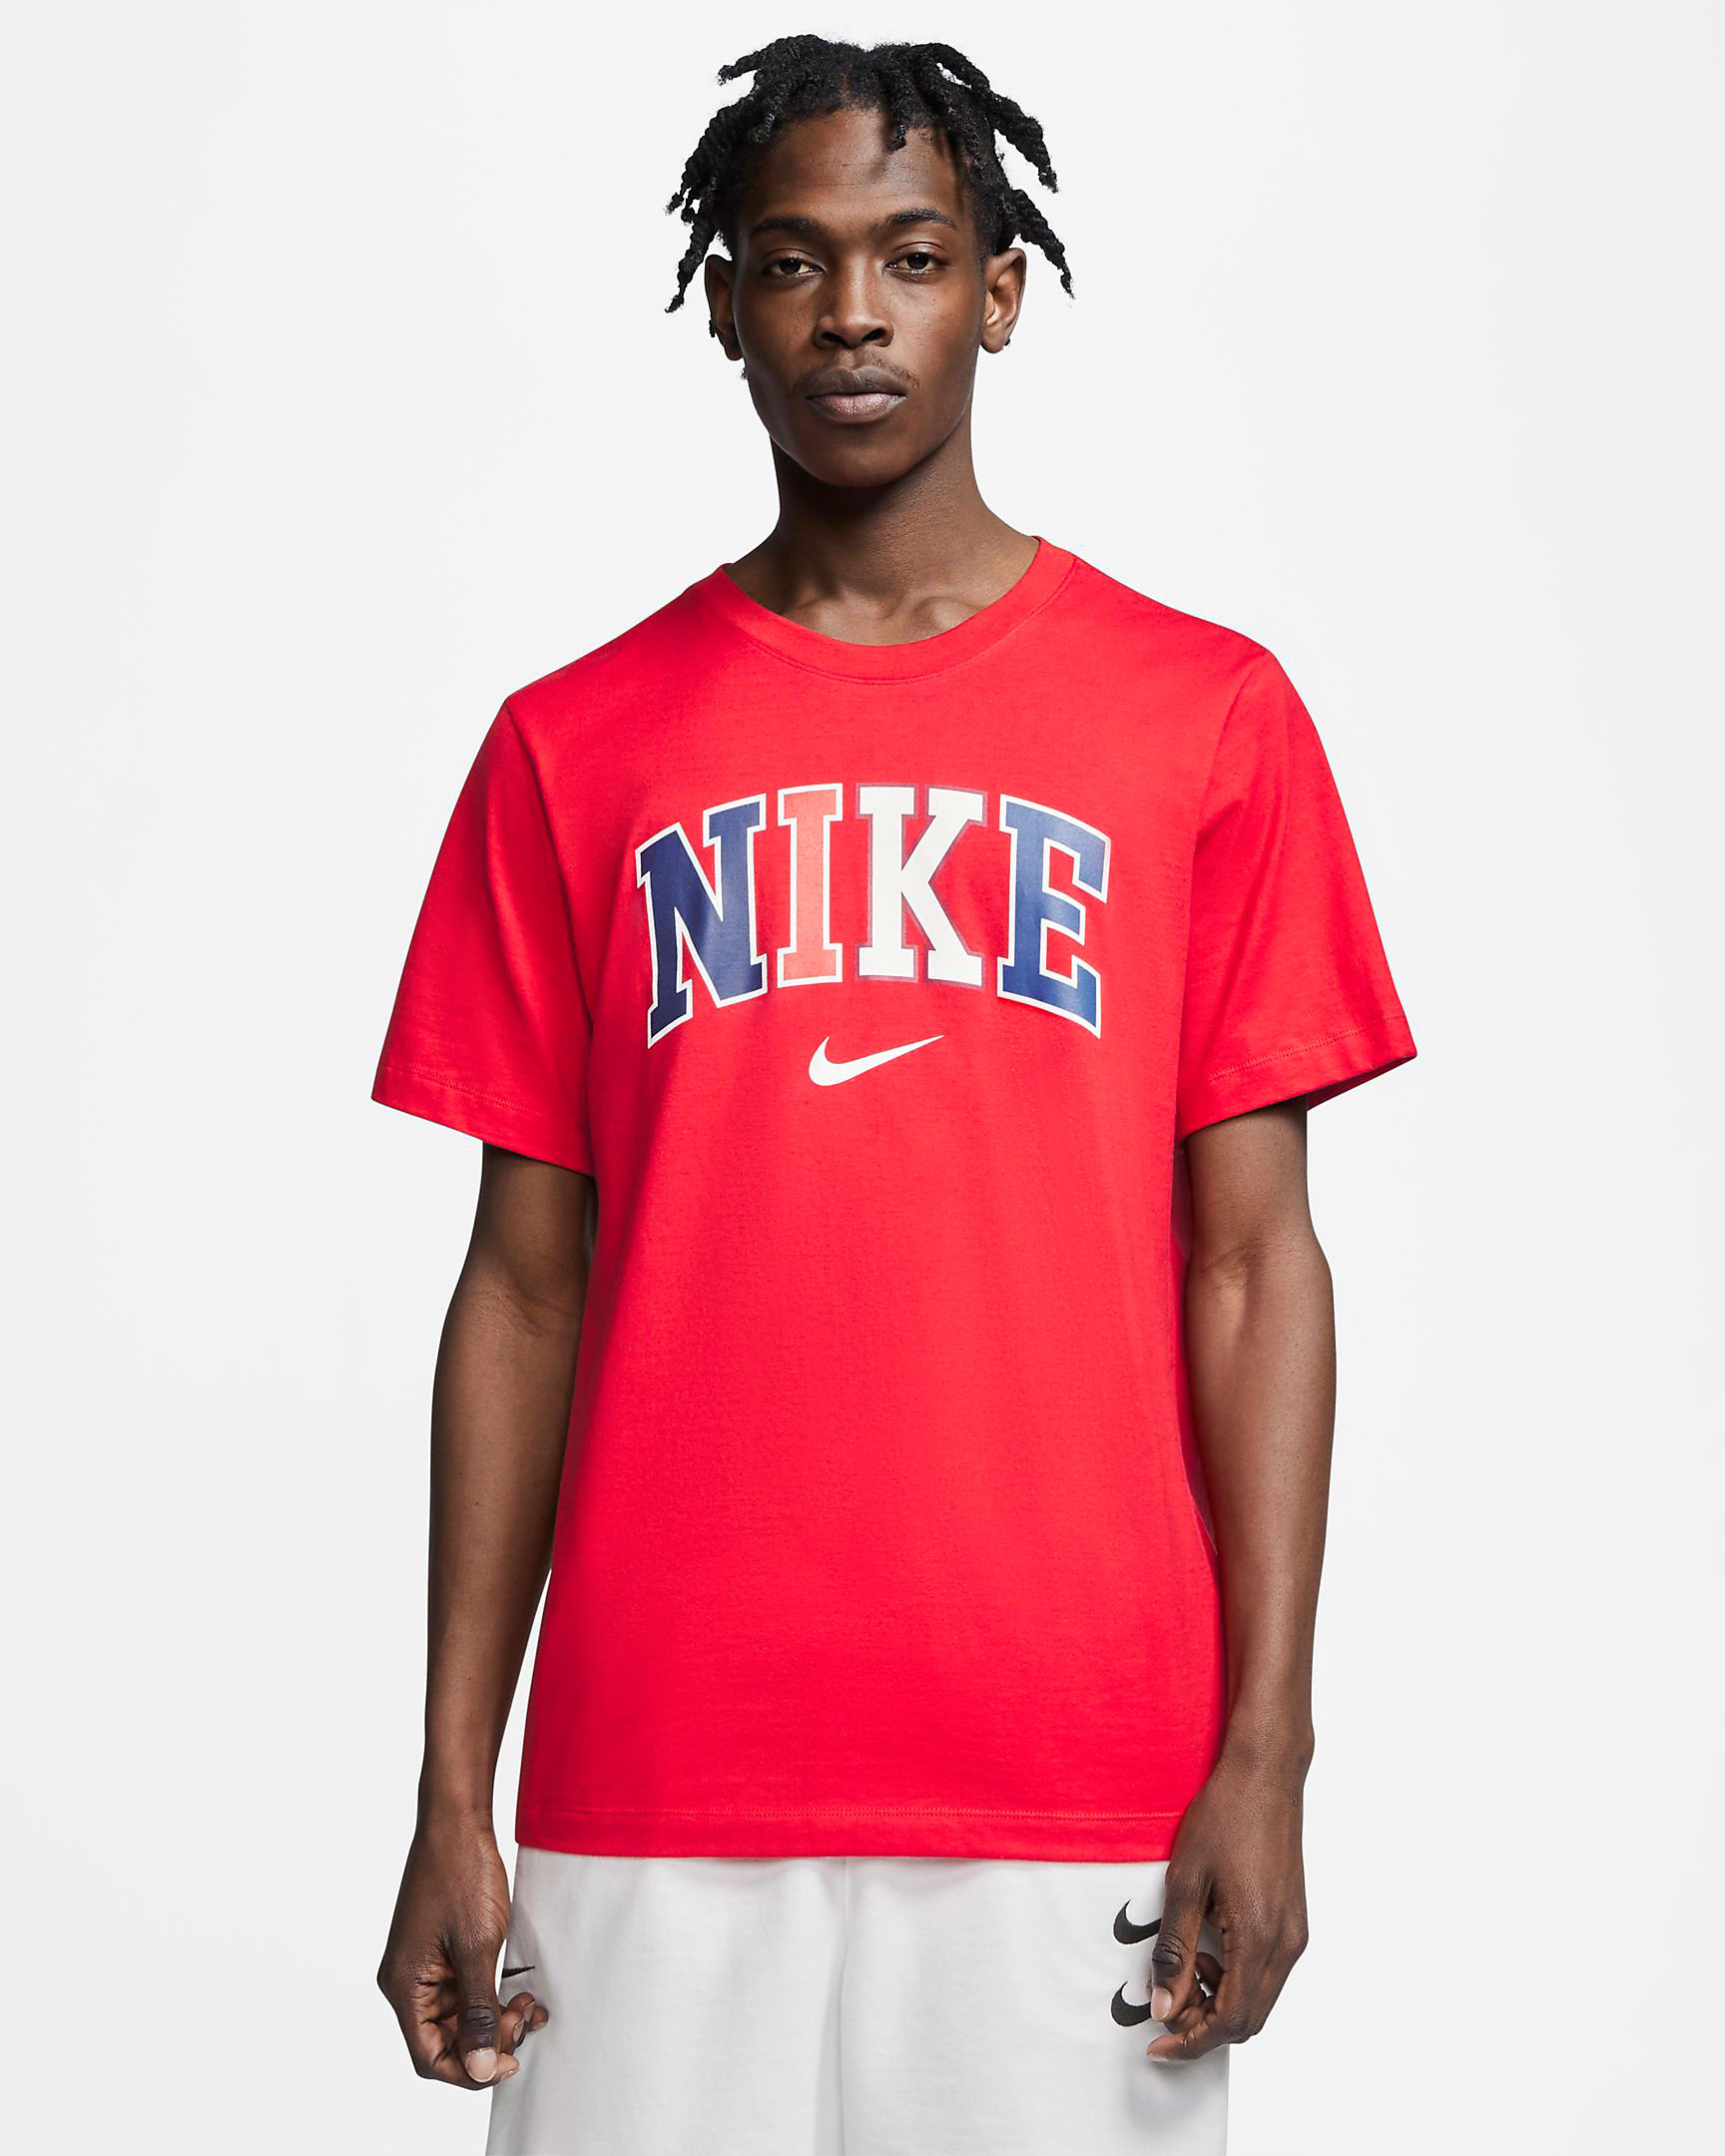 nike-sportswear-usa-americana-tee-shirt-red